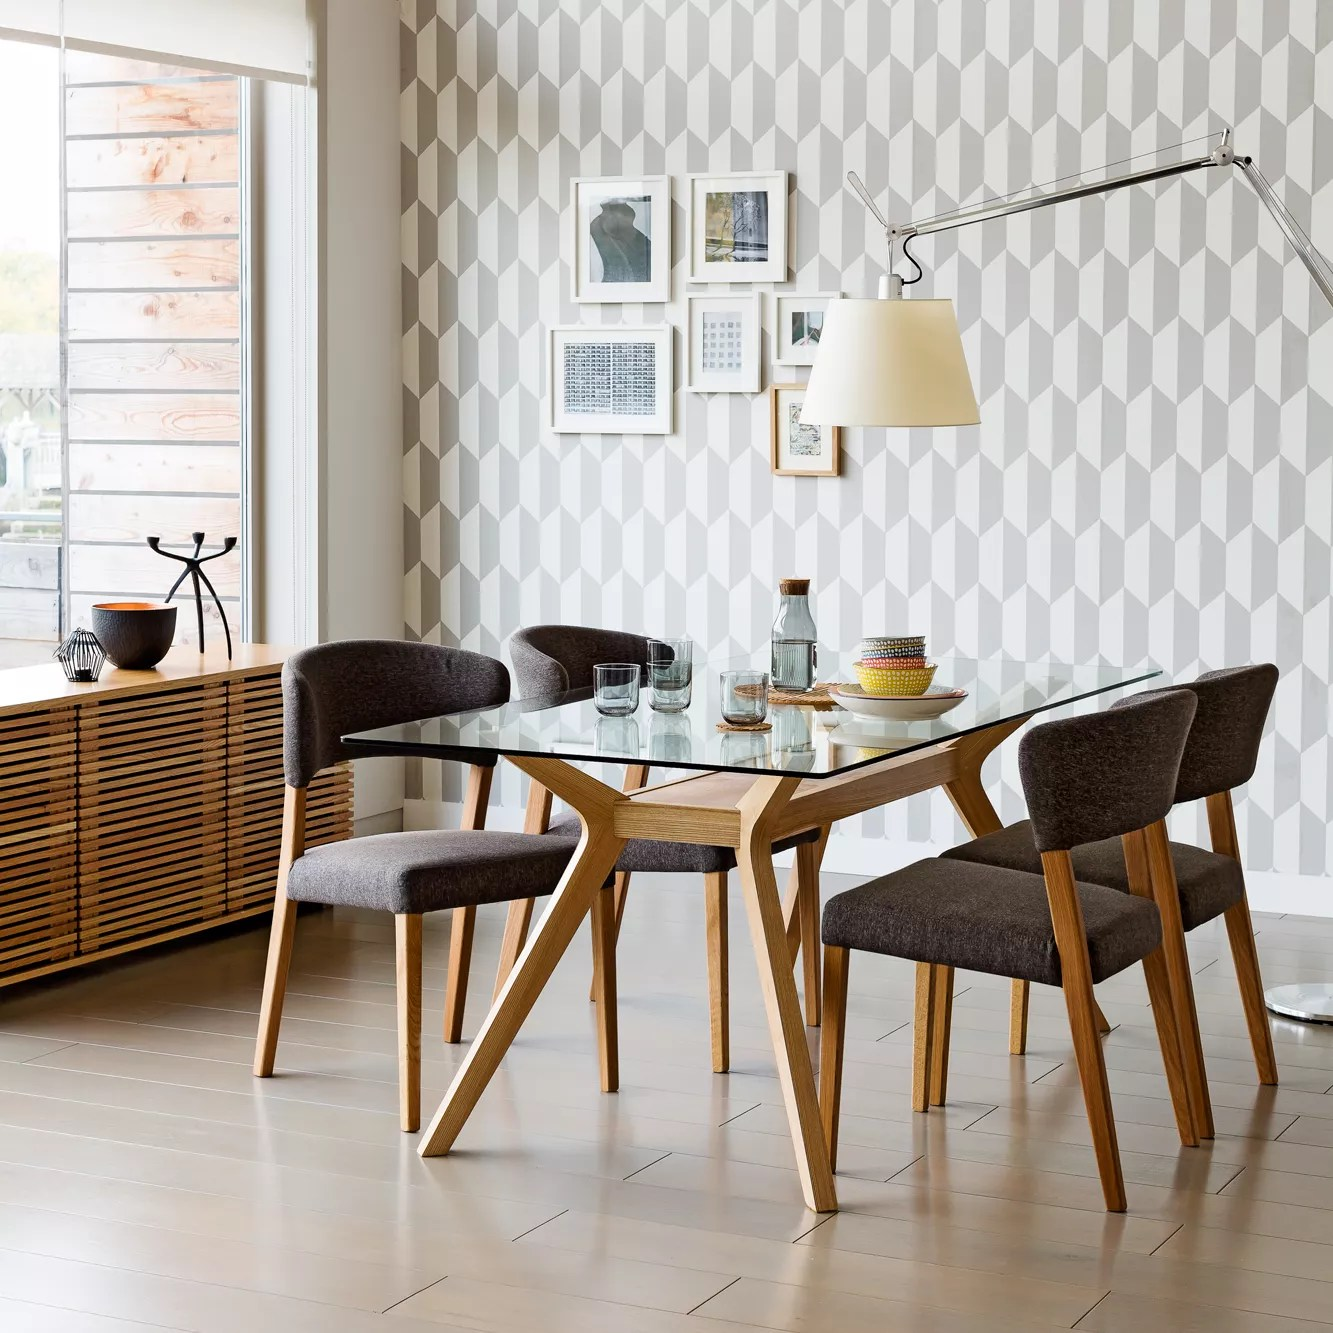 italian dining chairs australia glider chair target buy artemide tolomeo mega terra floor lamp | john lewis